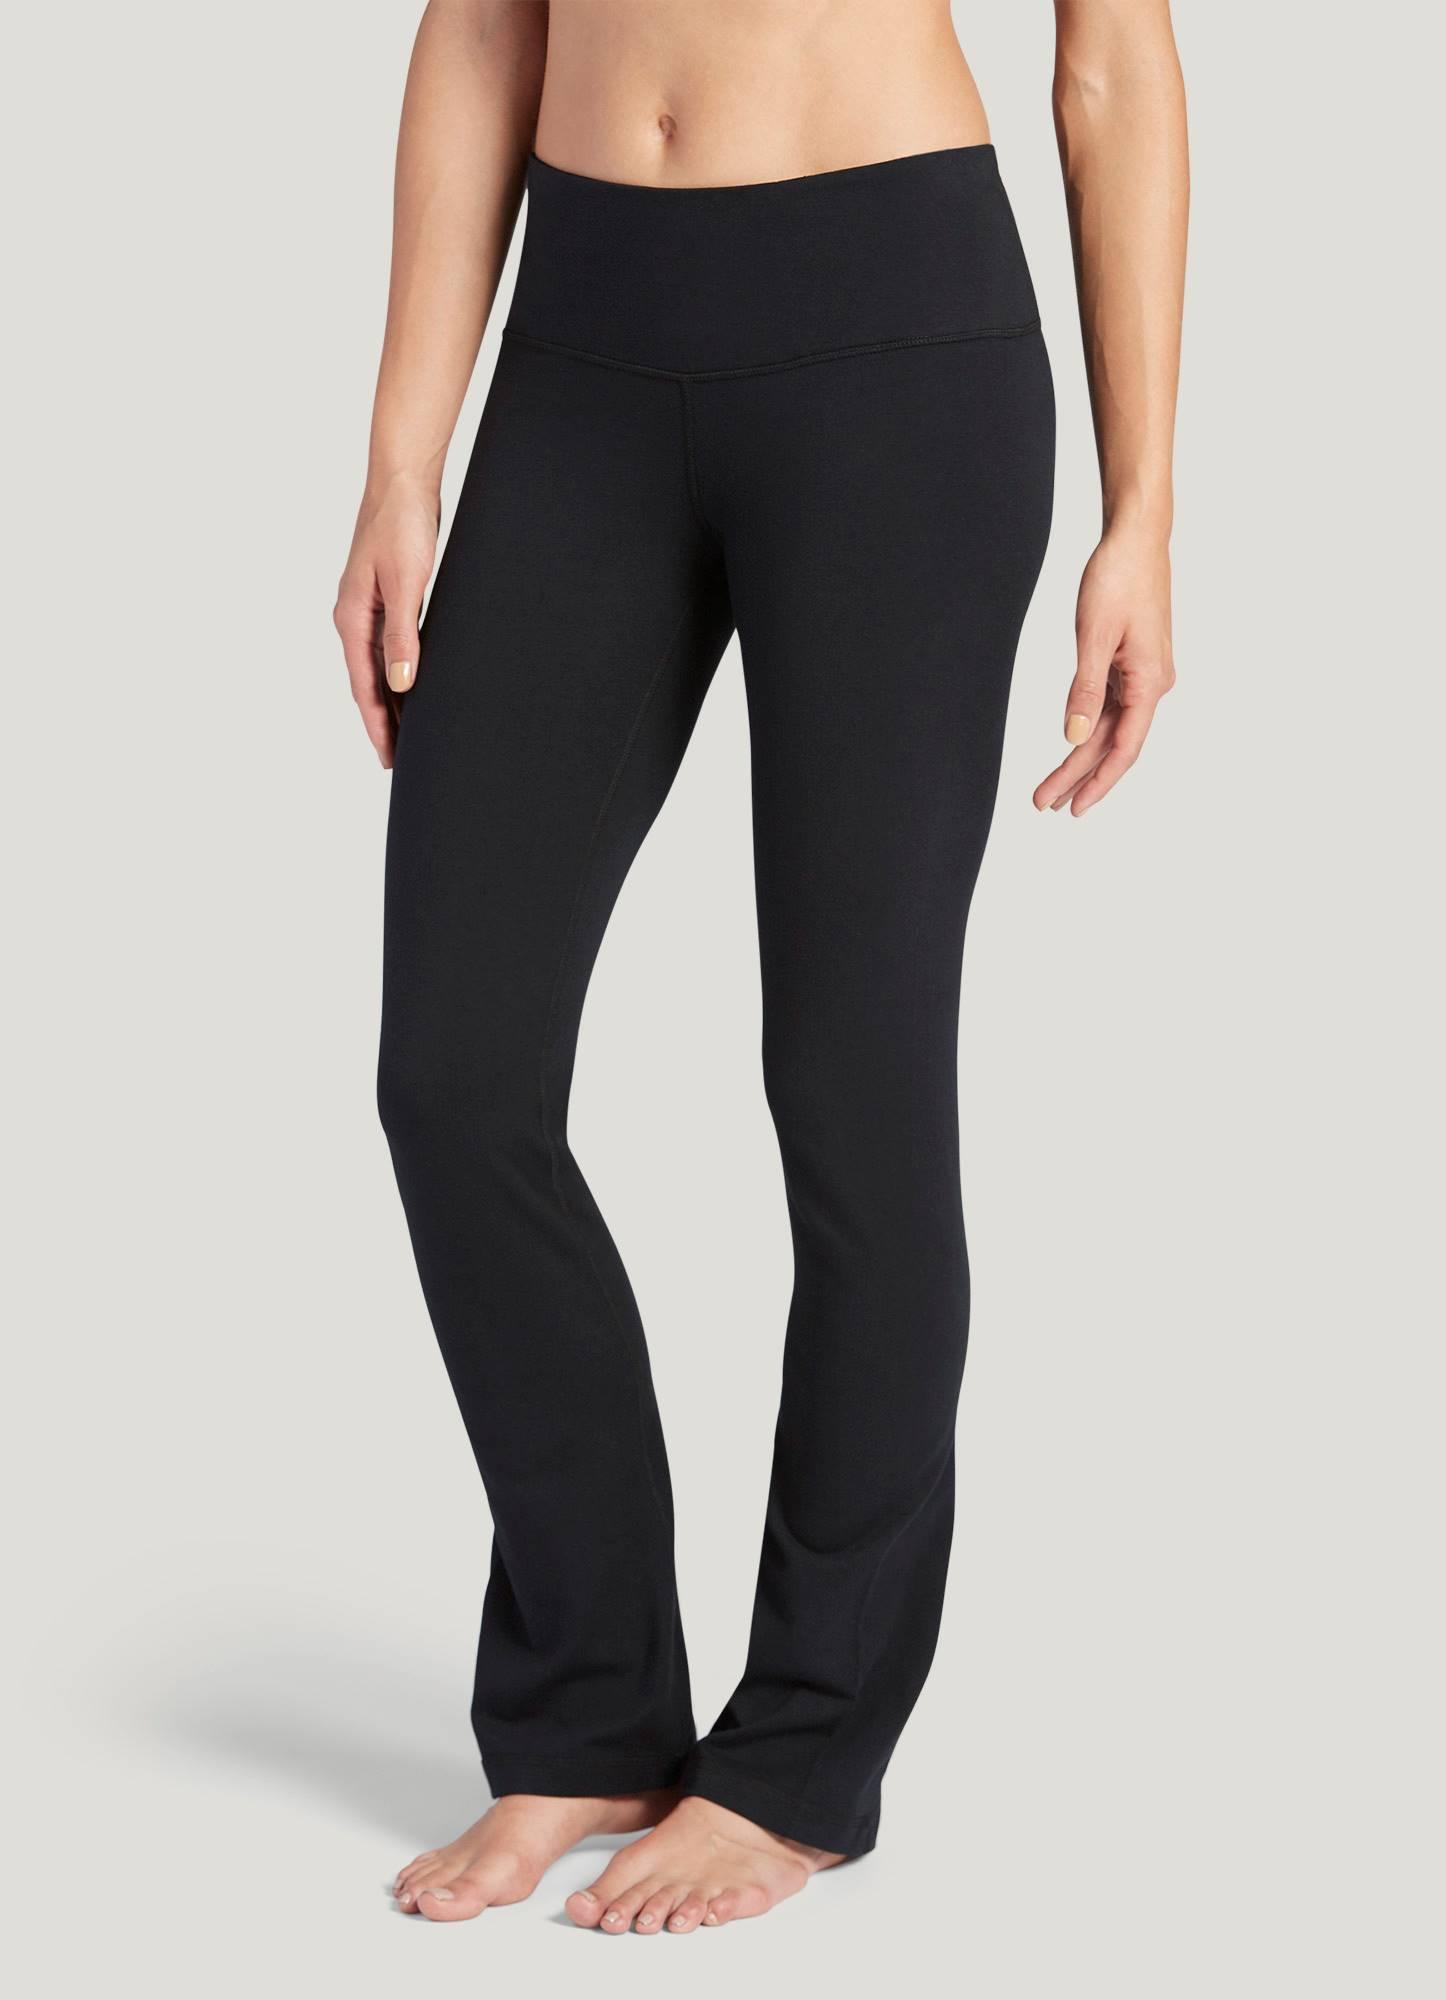 74e88653c805f Jockey Cotton Stretch Slim Bootleg Pant, black, S | Workout Clothes ...